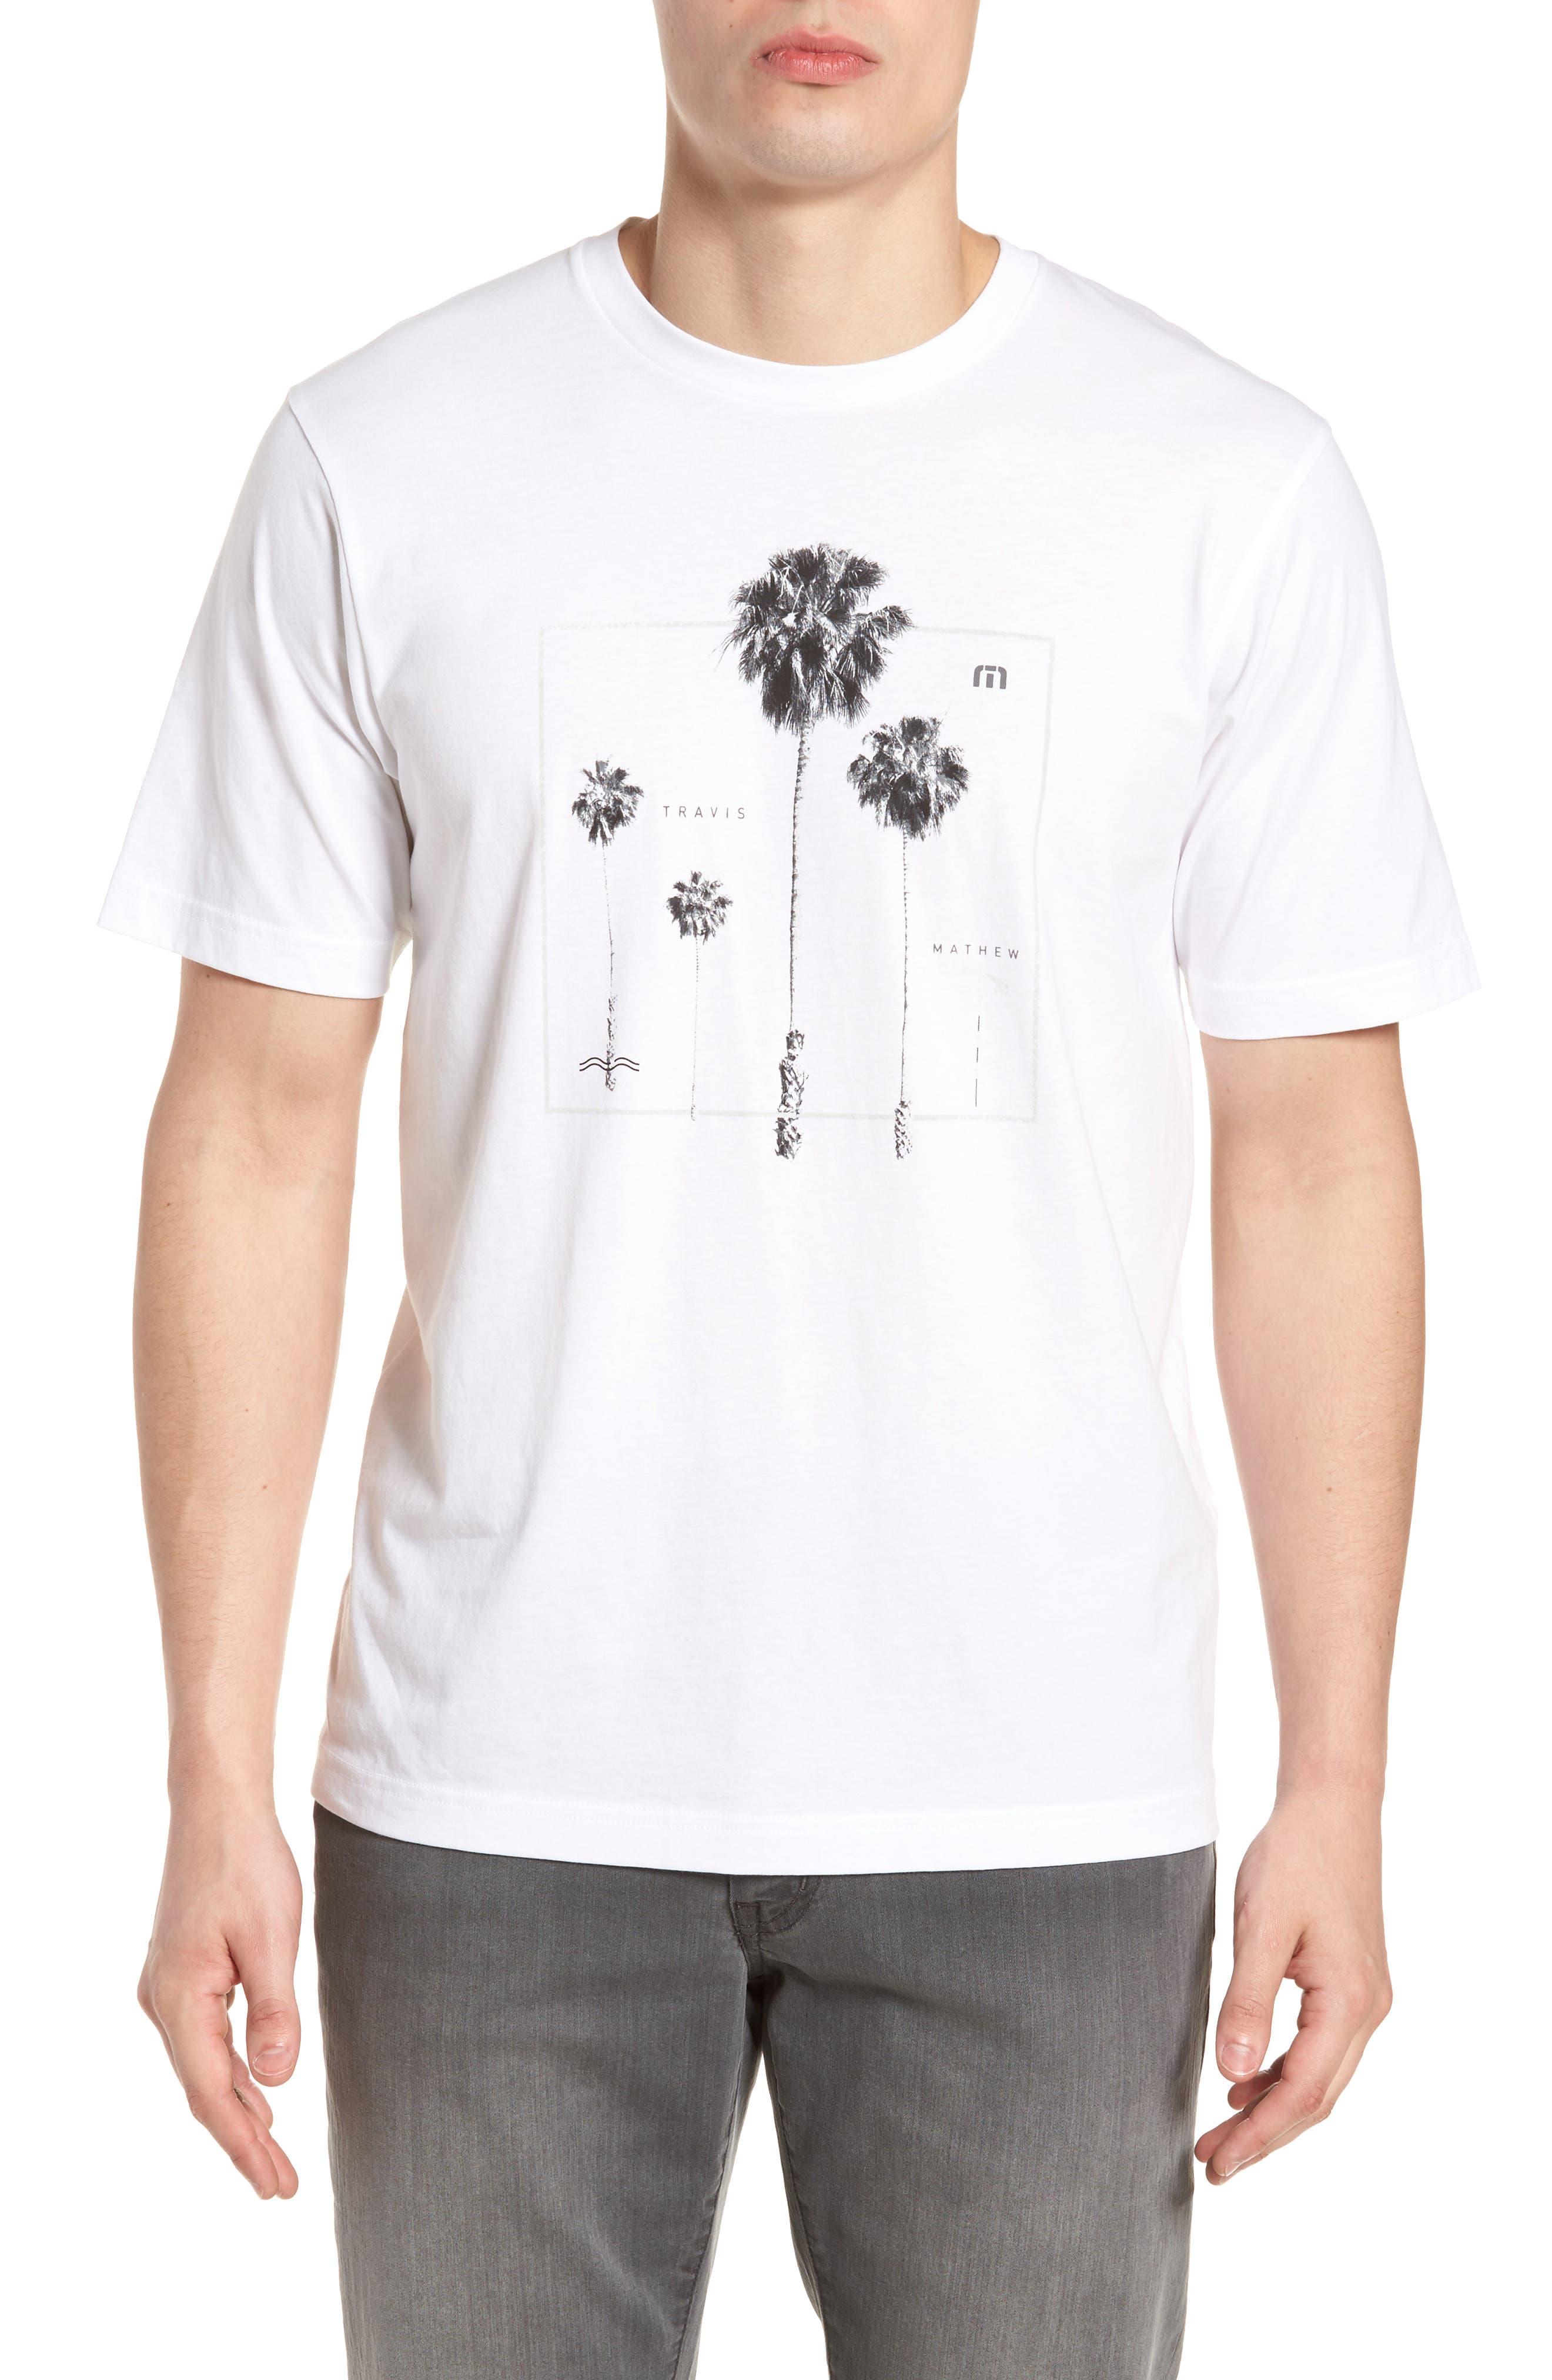 Alternate Image 1 Selected - Travis Mathew Play Hard Graphic T-Shirt